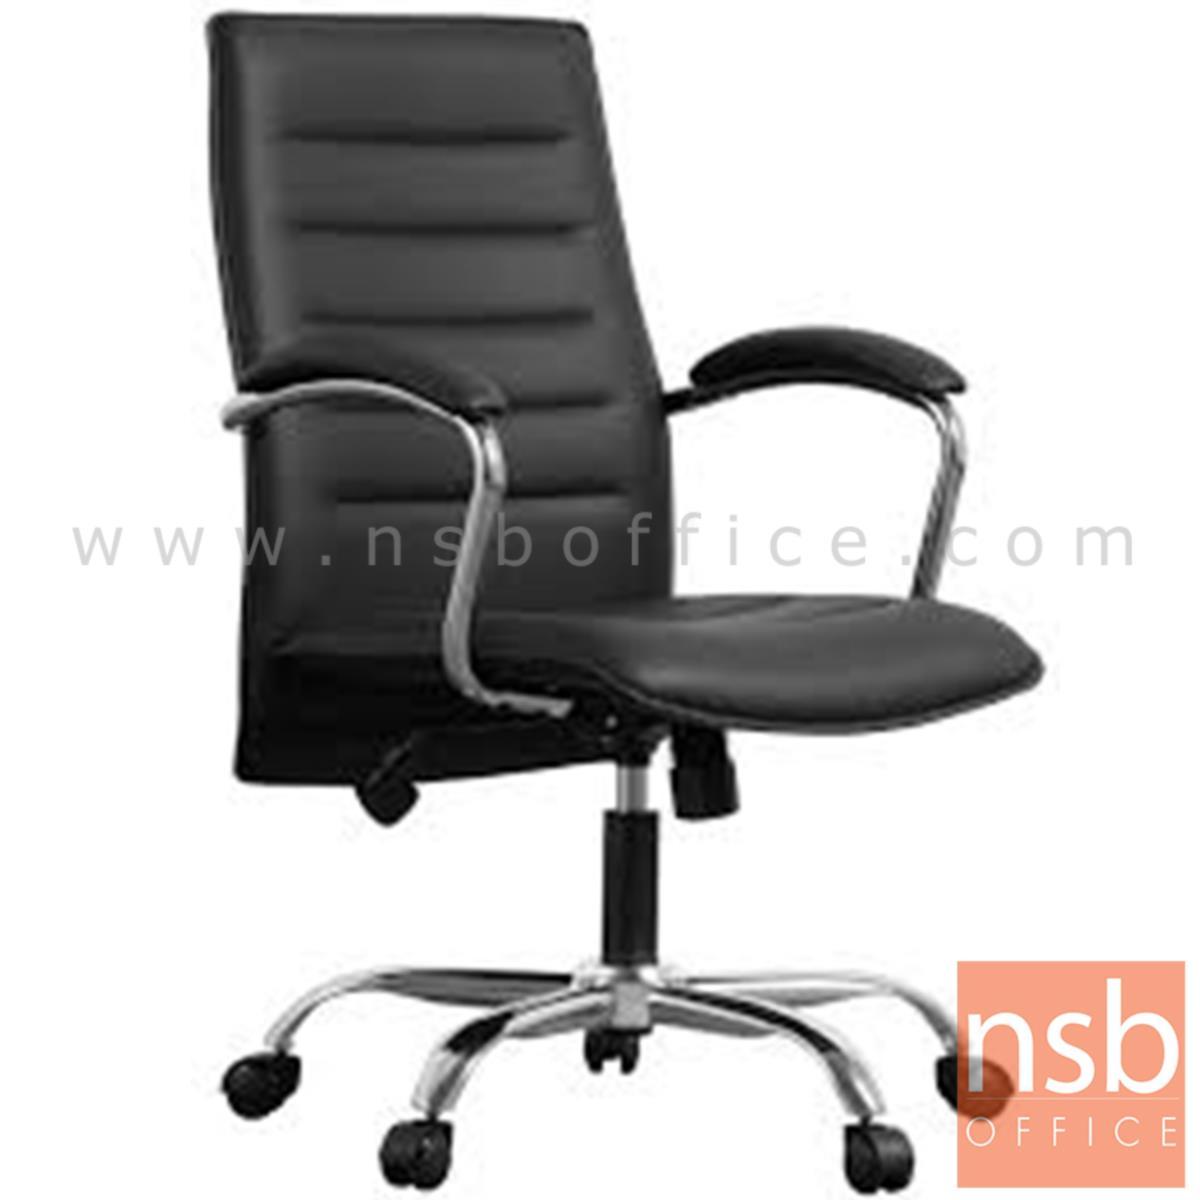 B26A106:เก้าอี้สำนักงาน รุ่น MN-SOM  มีก้อนโยก ขาเหล็กชุบโครเมี่ยม